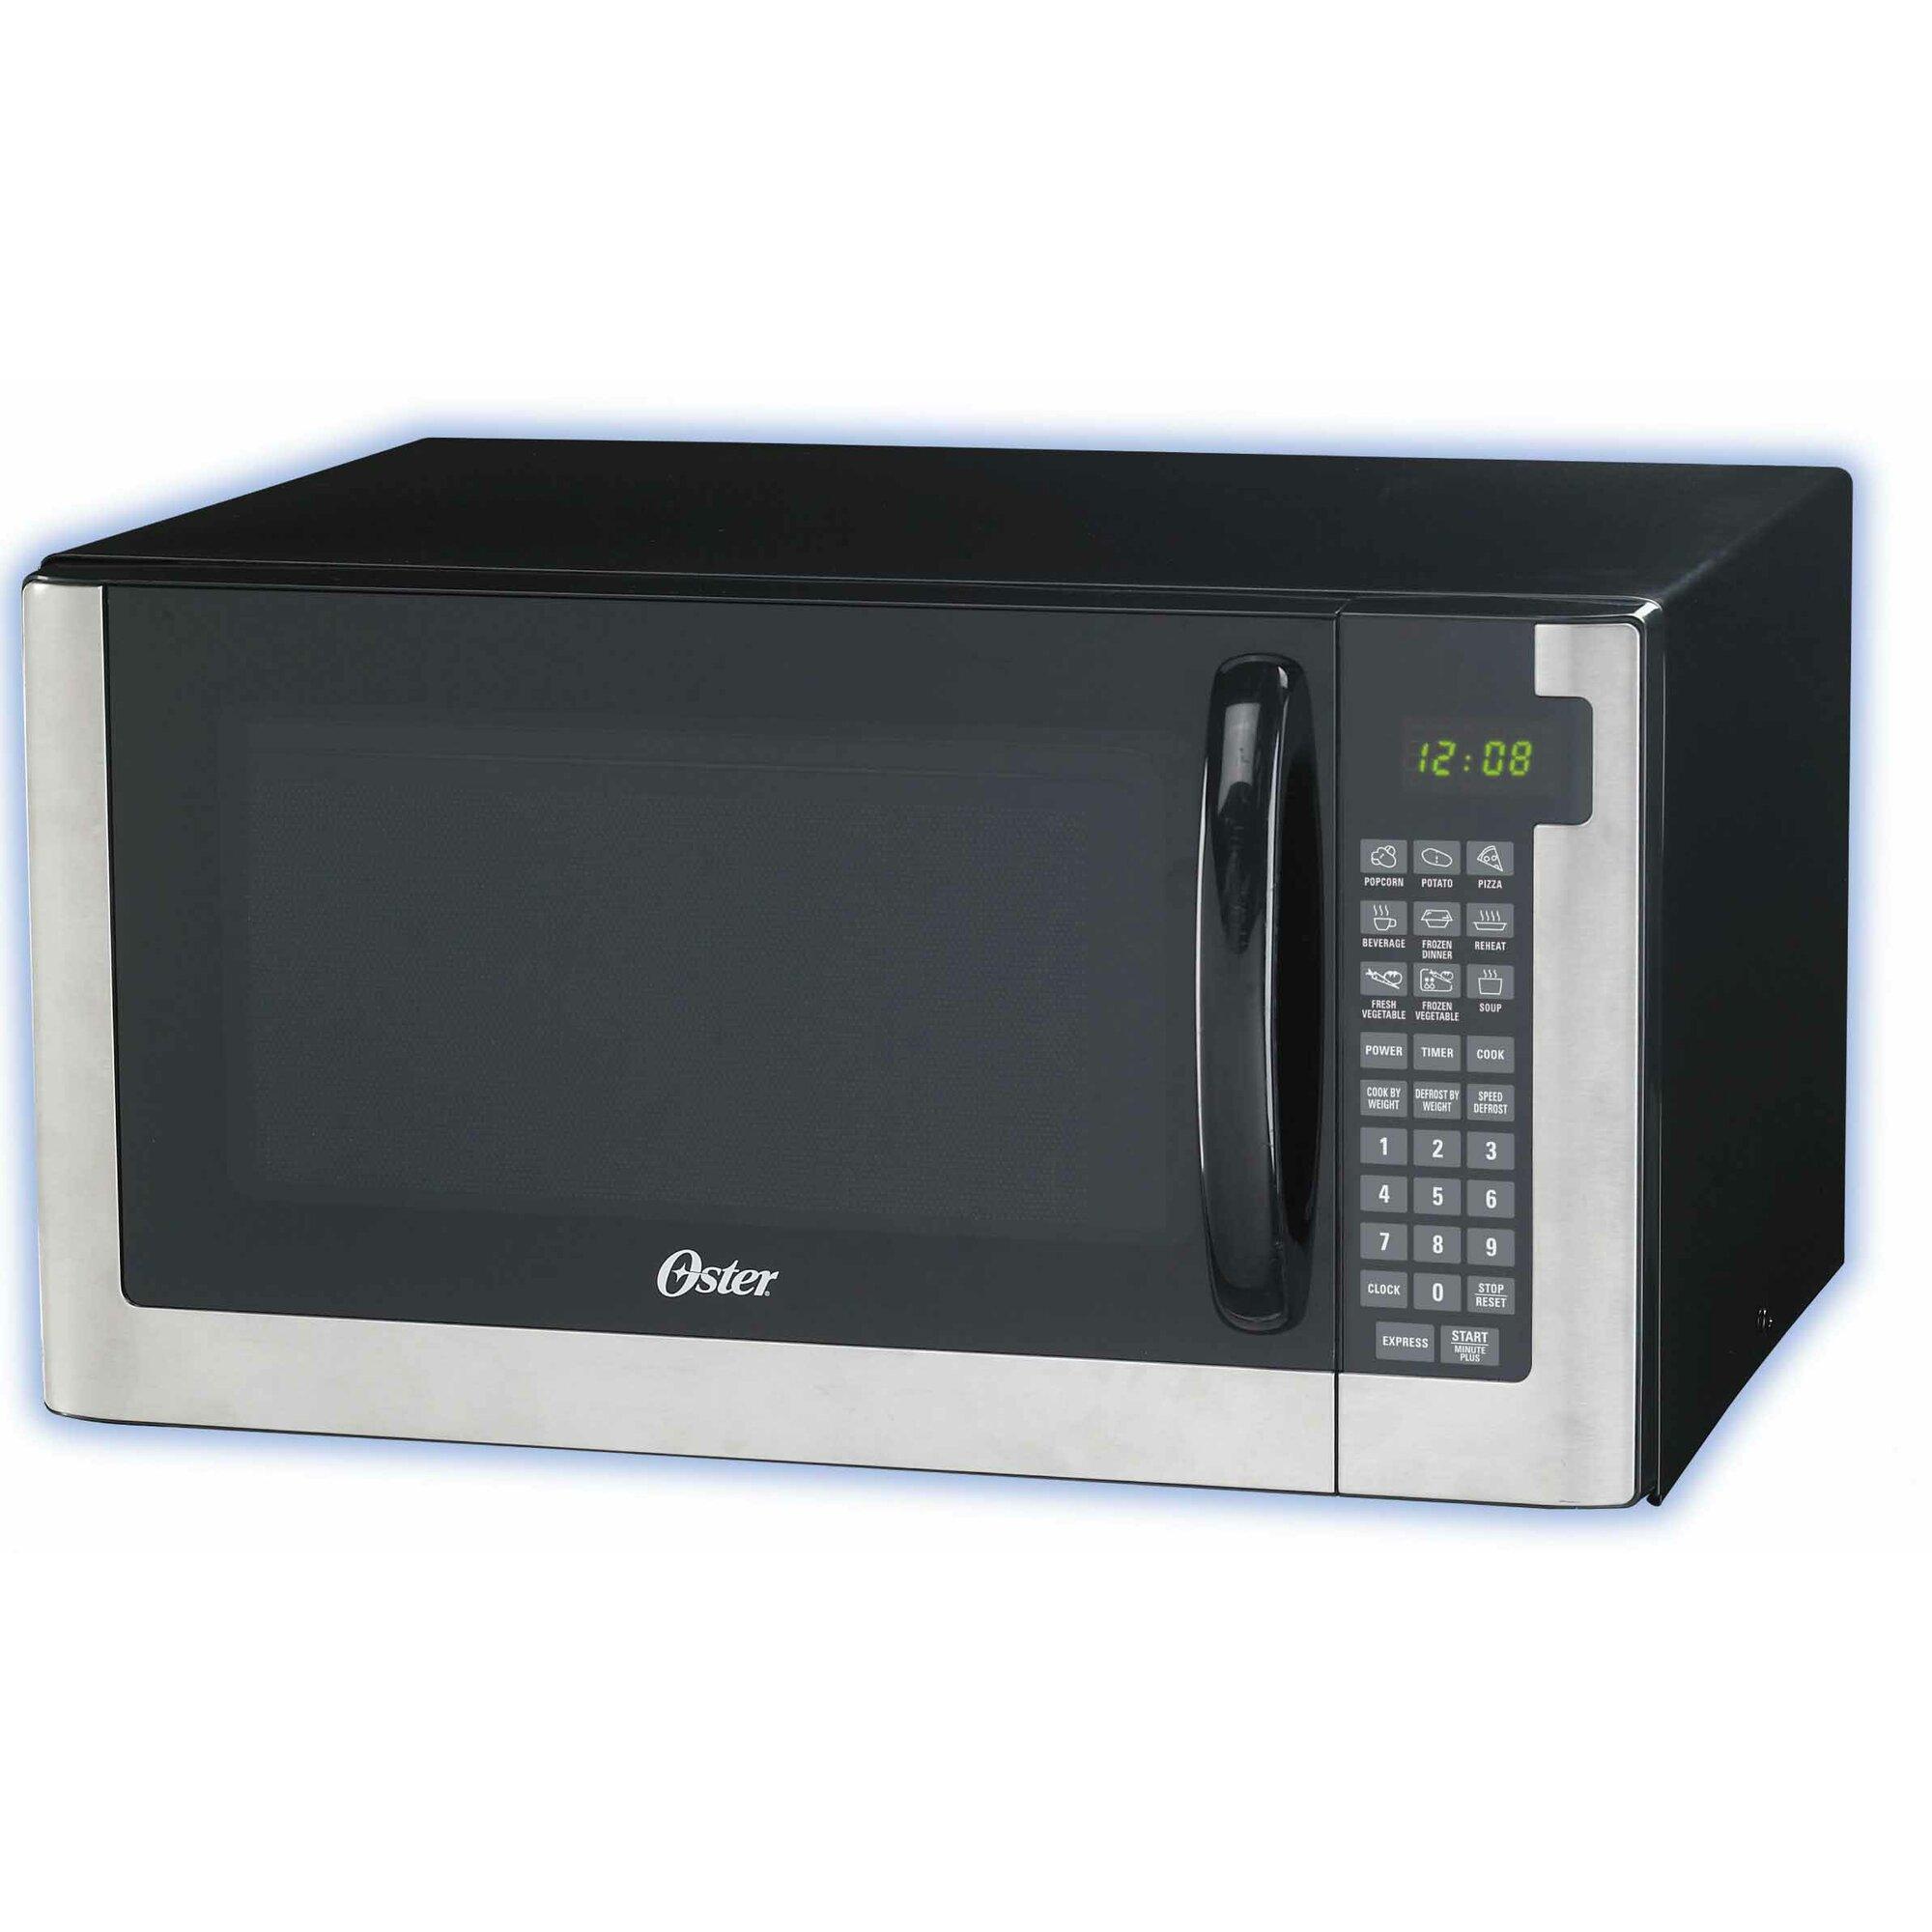 Countertop Microwaves You'll Love | Wayfair